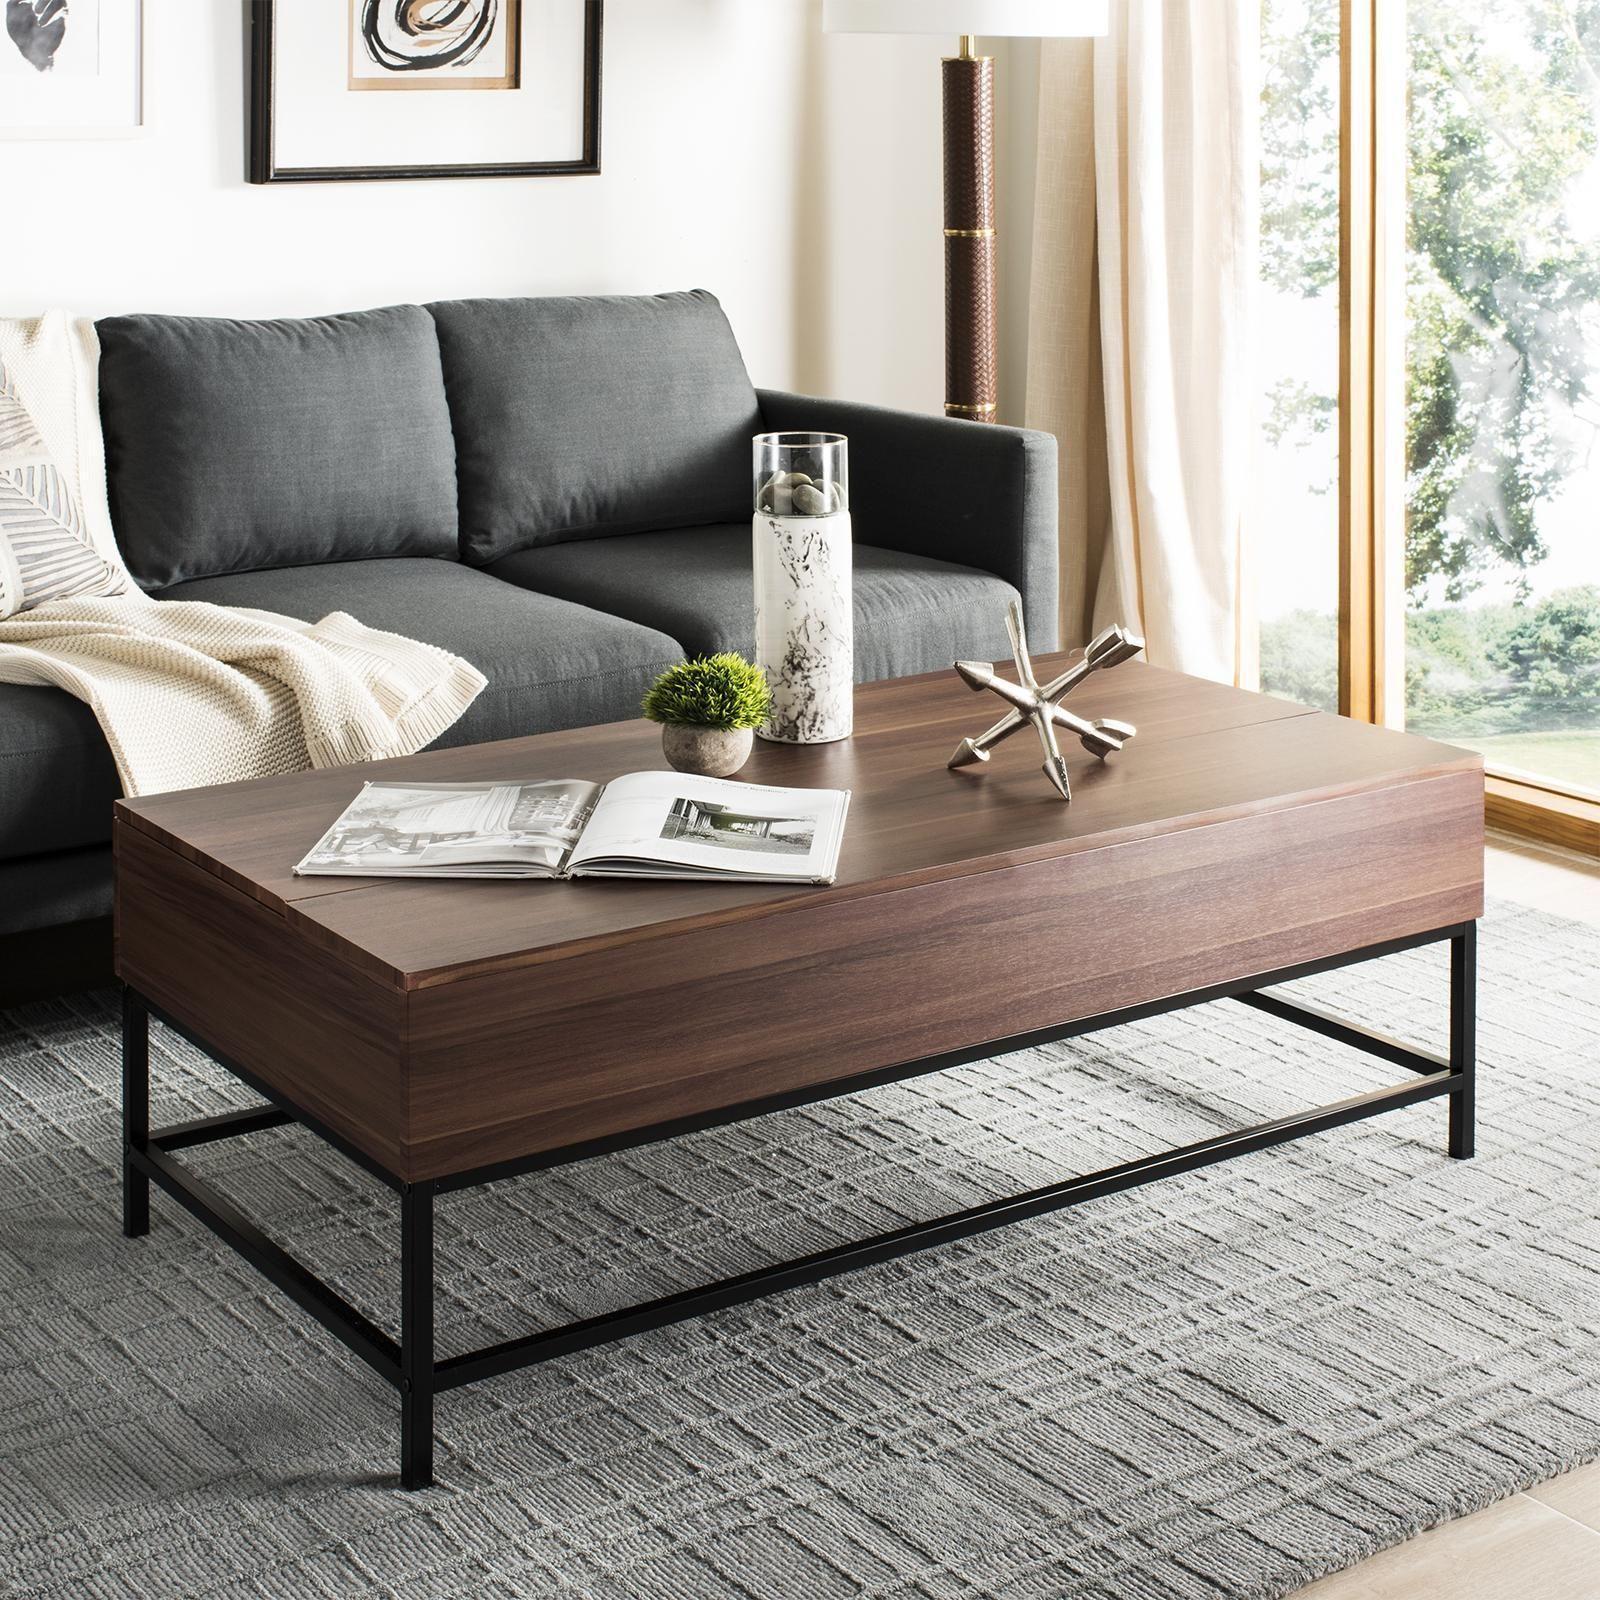 Safavieh Gina Lift Top Coffee Table Dark Oak In 2021 Lift Top Coffee Table Coffee Table Coffee Table Furniture [ 1600 x 1600 Pixel ]